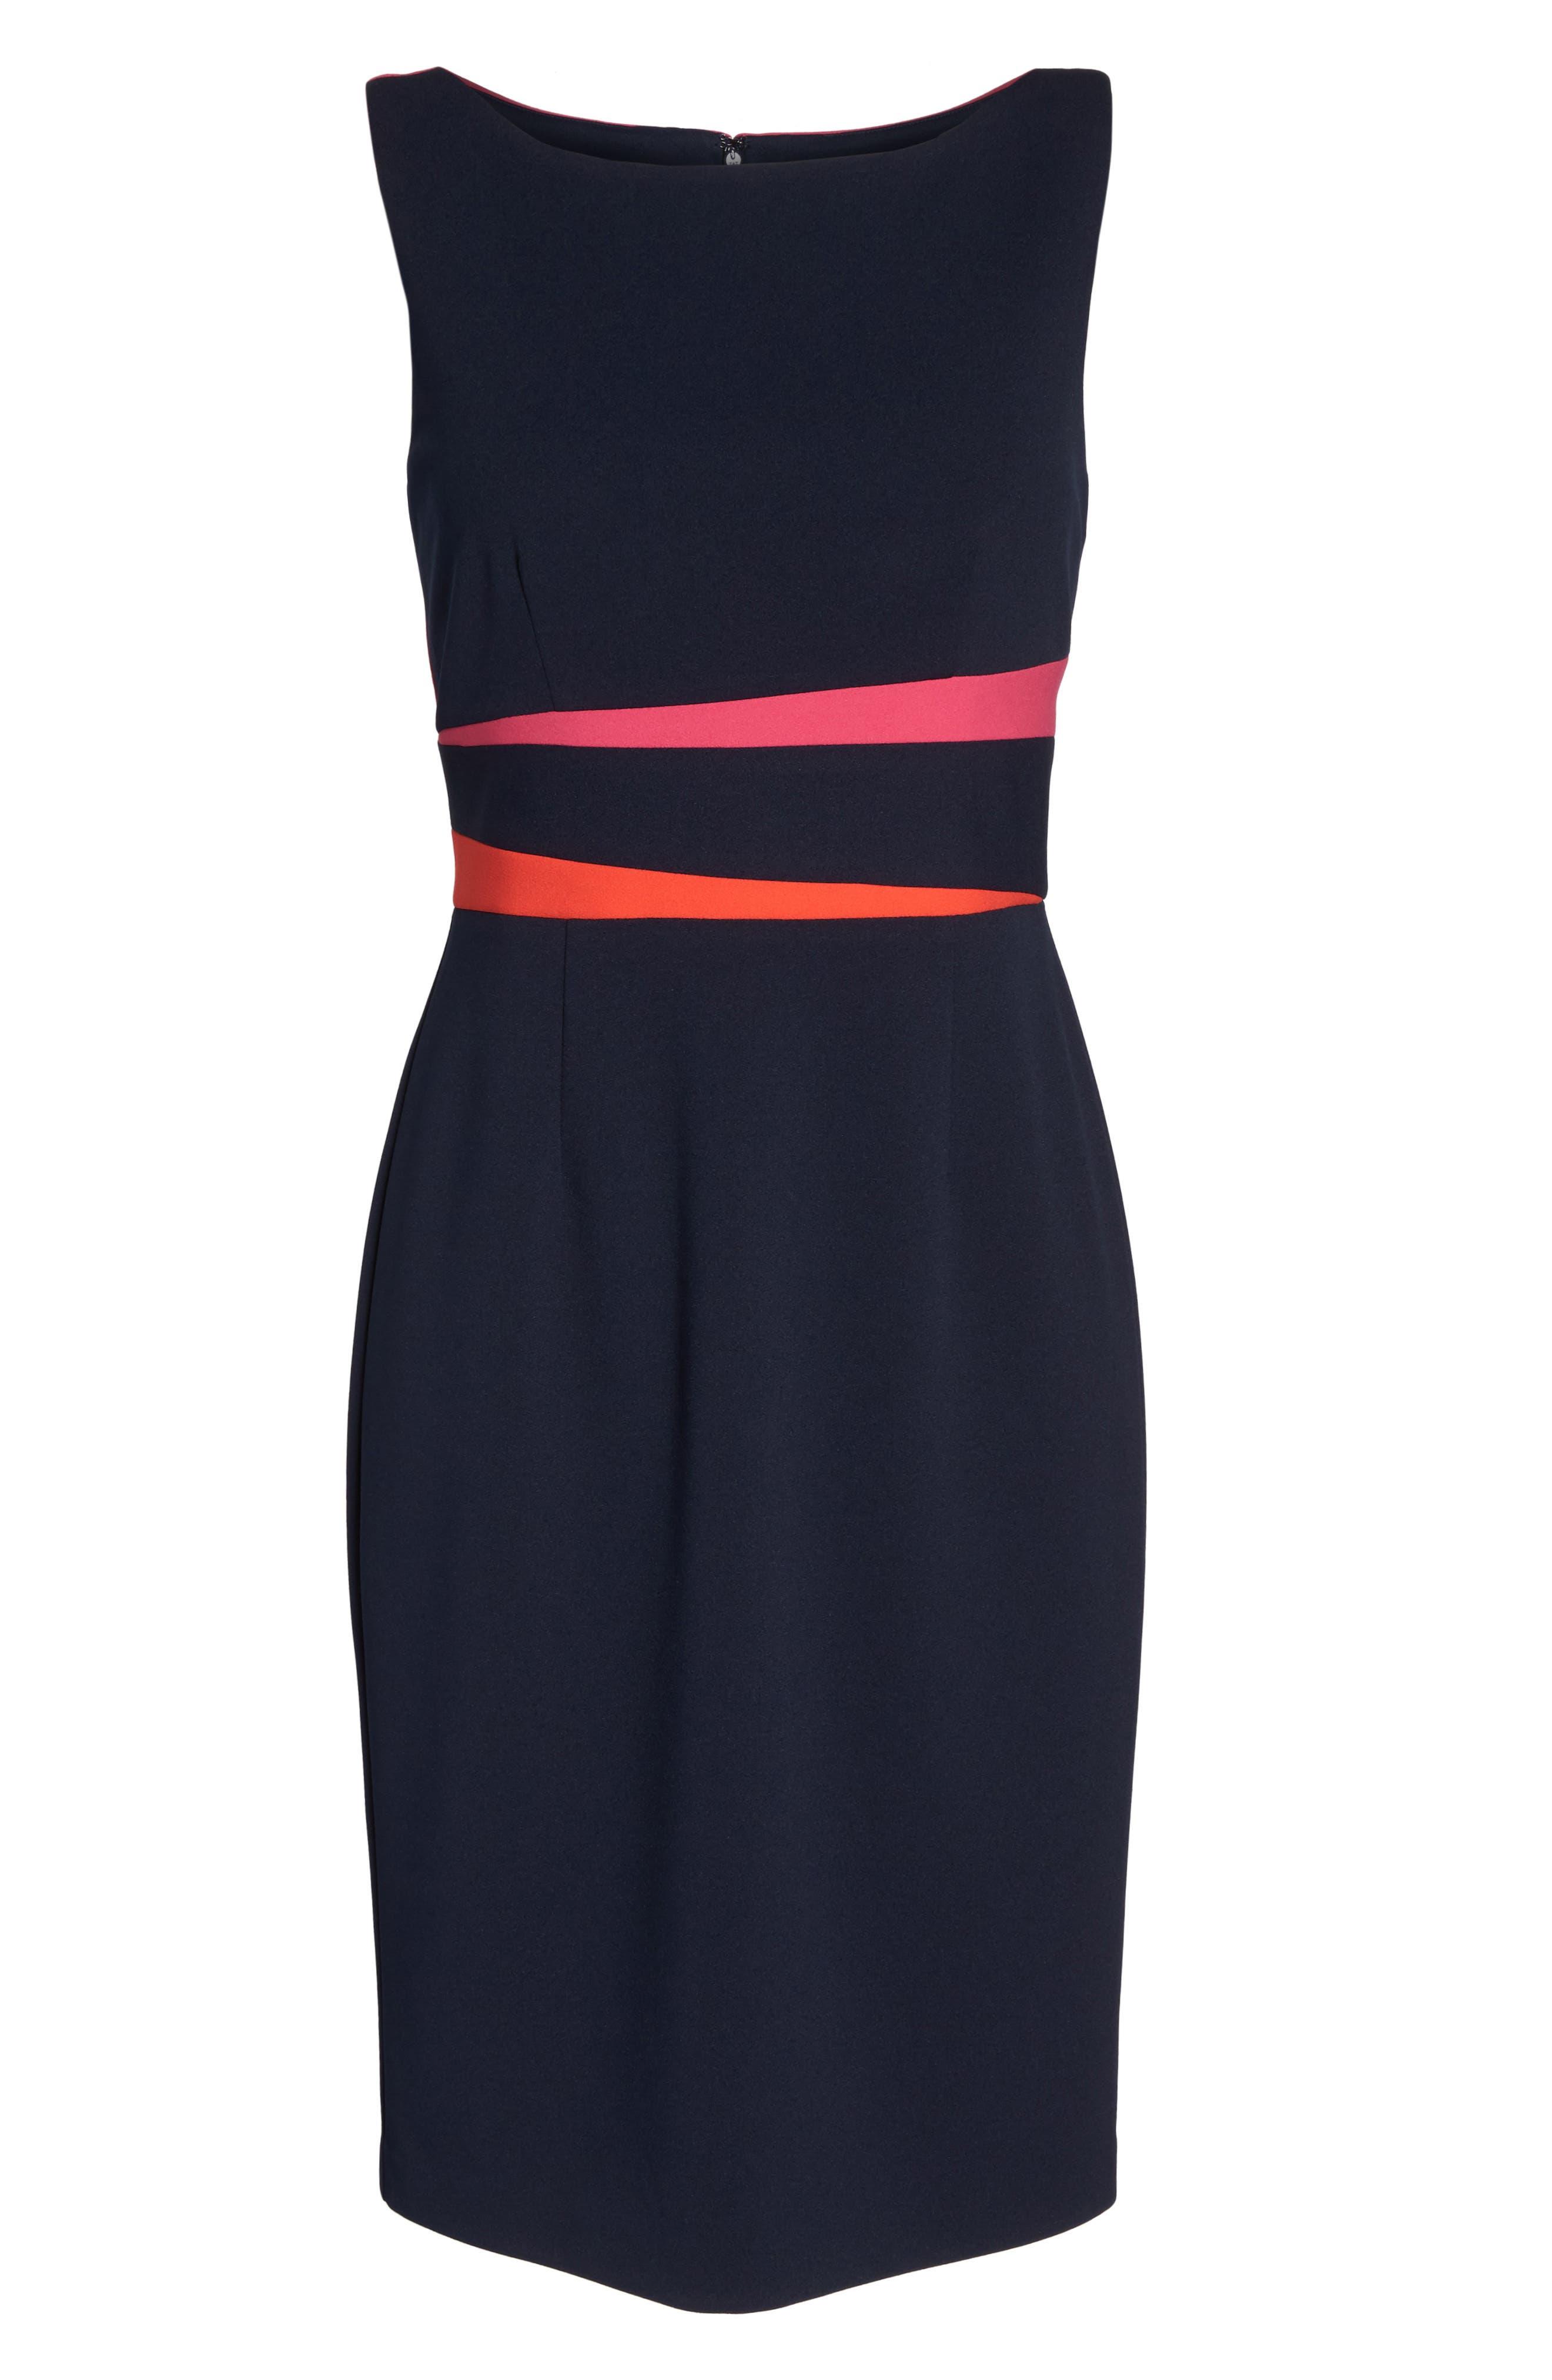 Sleeveless Colorblock Dress,                             Alternate thumbnail 6, color,                             Navy/ Pink